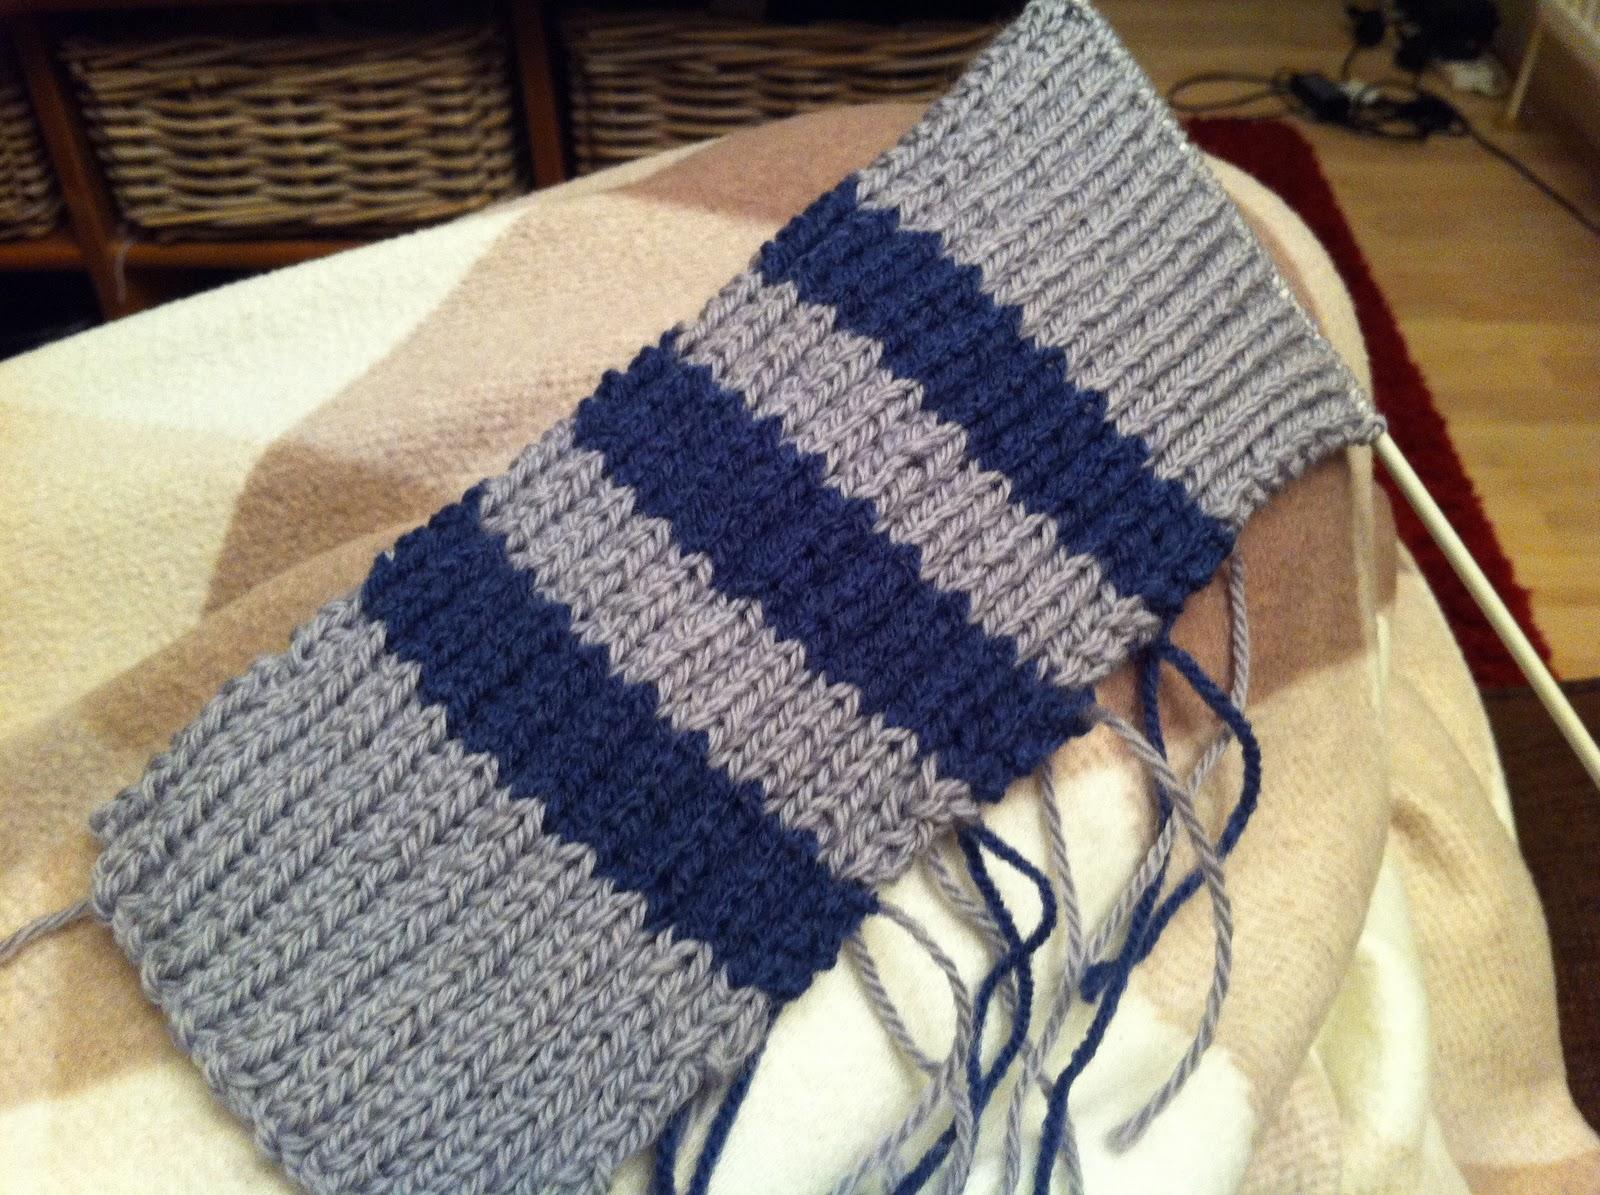 KraftyKat: Intermediate Knitting #2/3: Increasing and Decreasing Fun